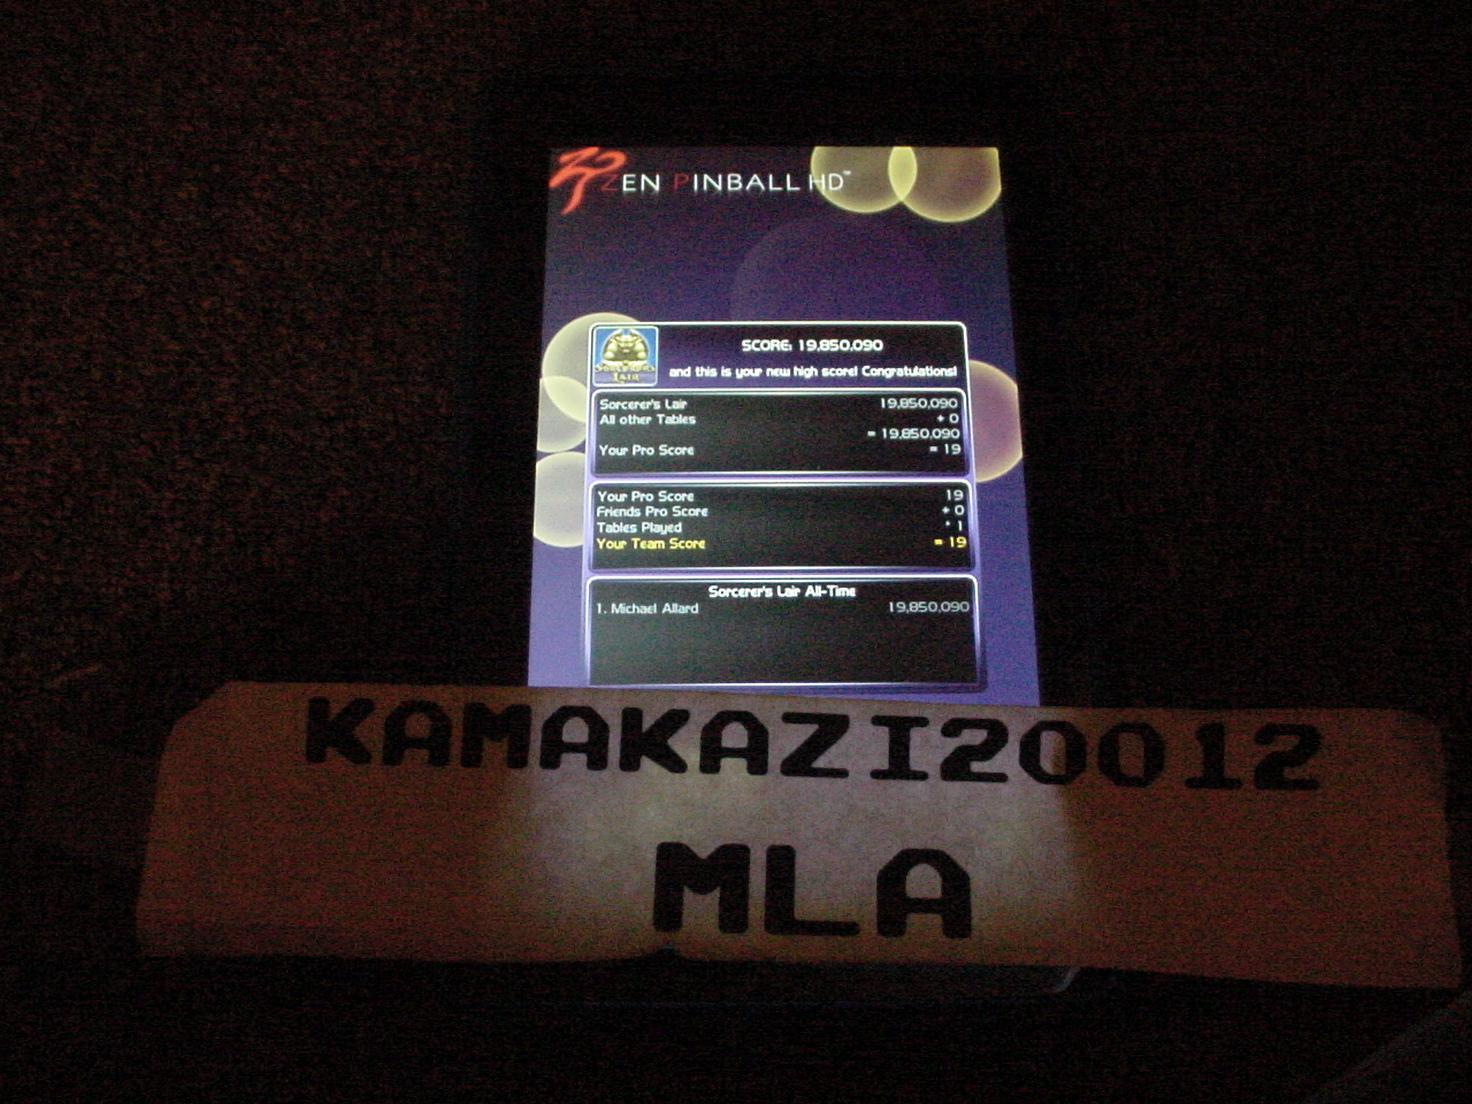 kamakazi20012: Zen Pinball 2: Sorcerer